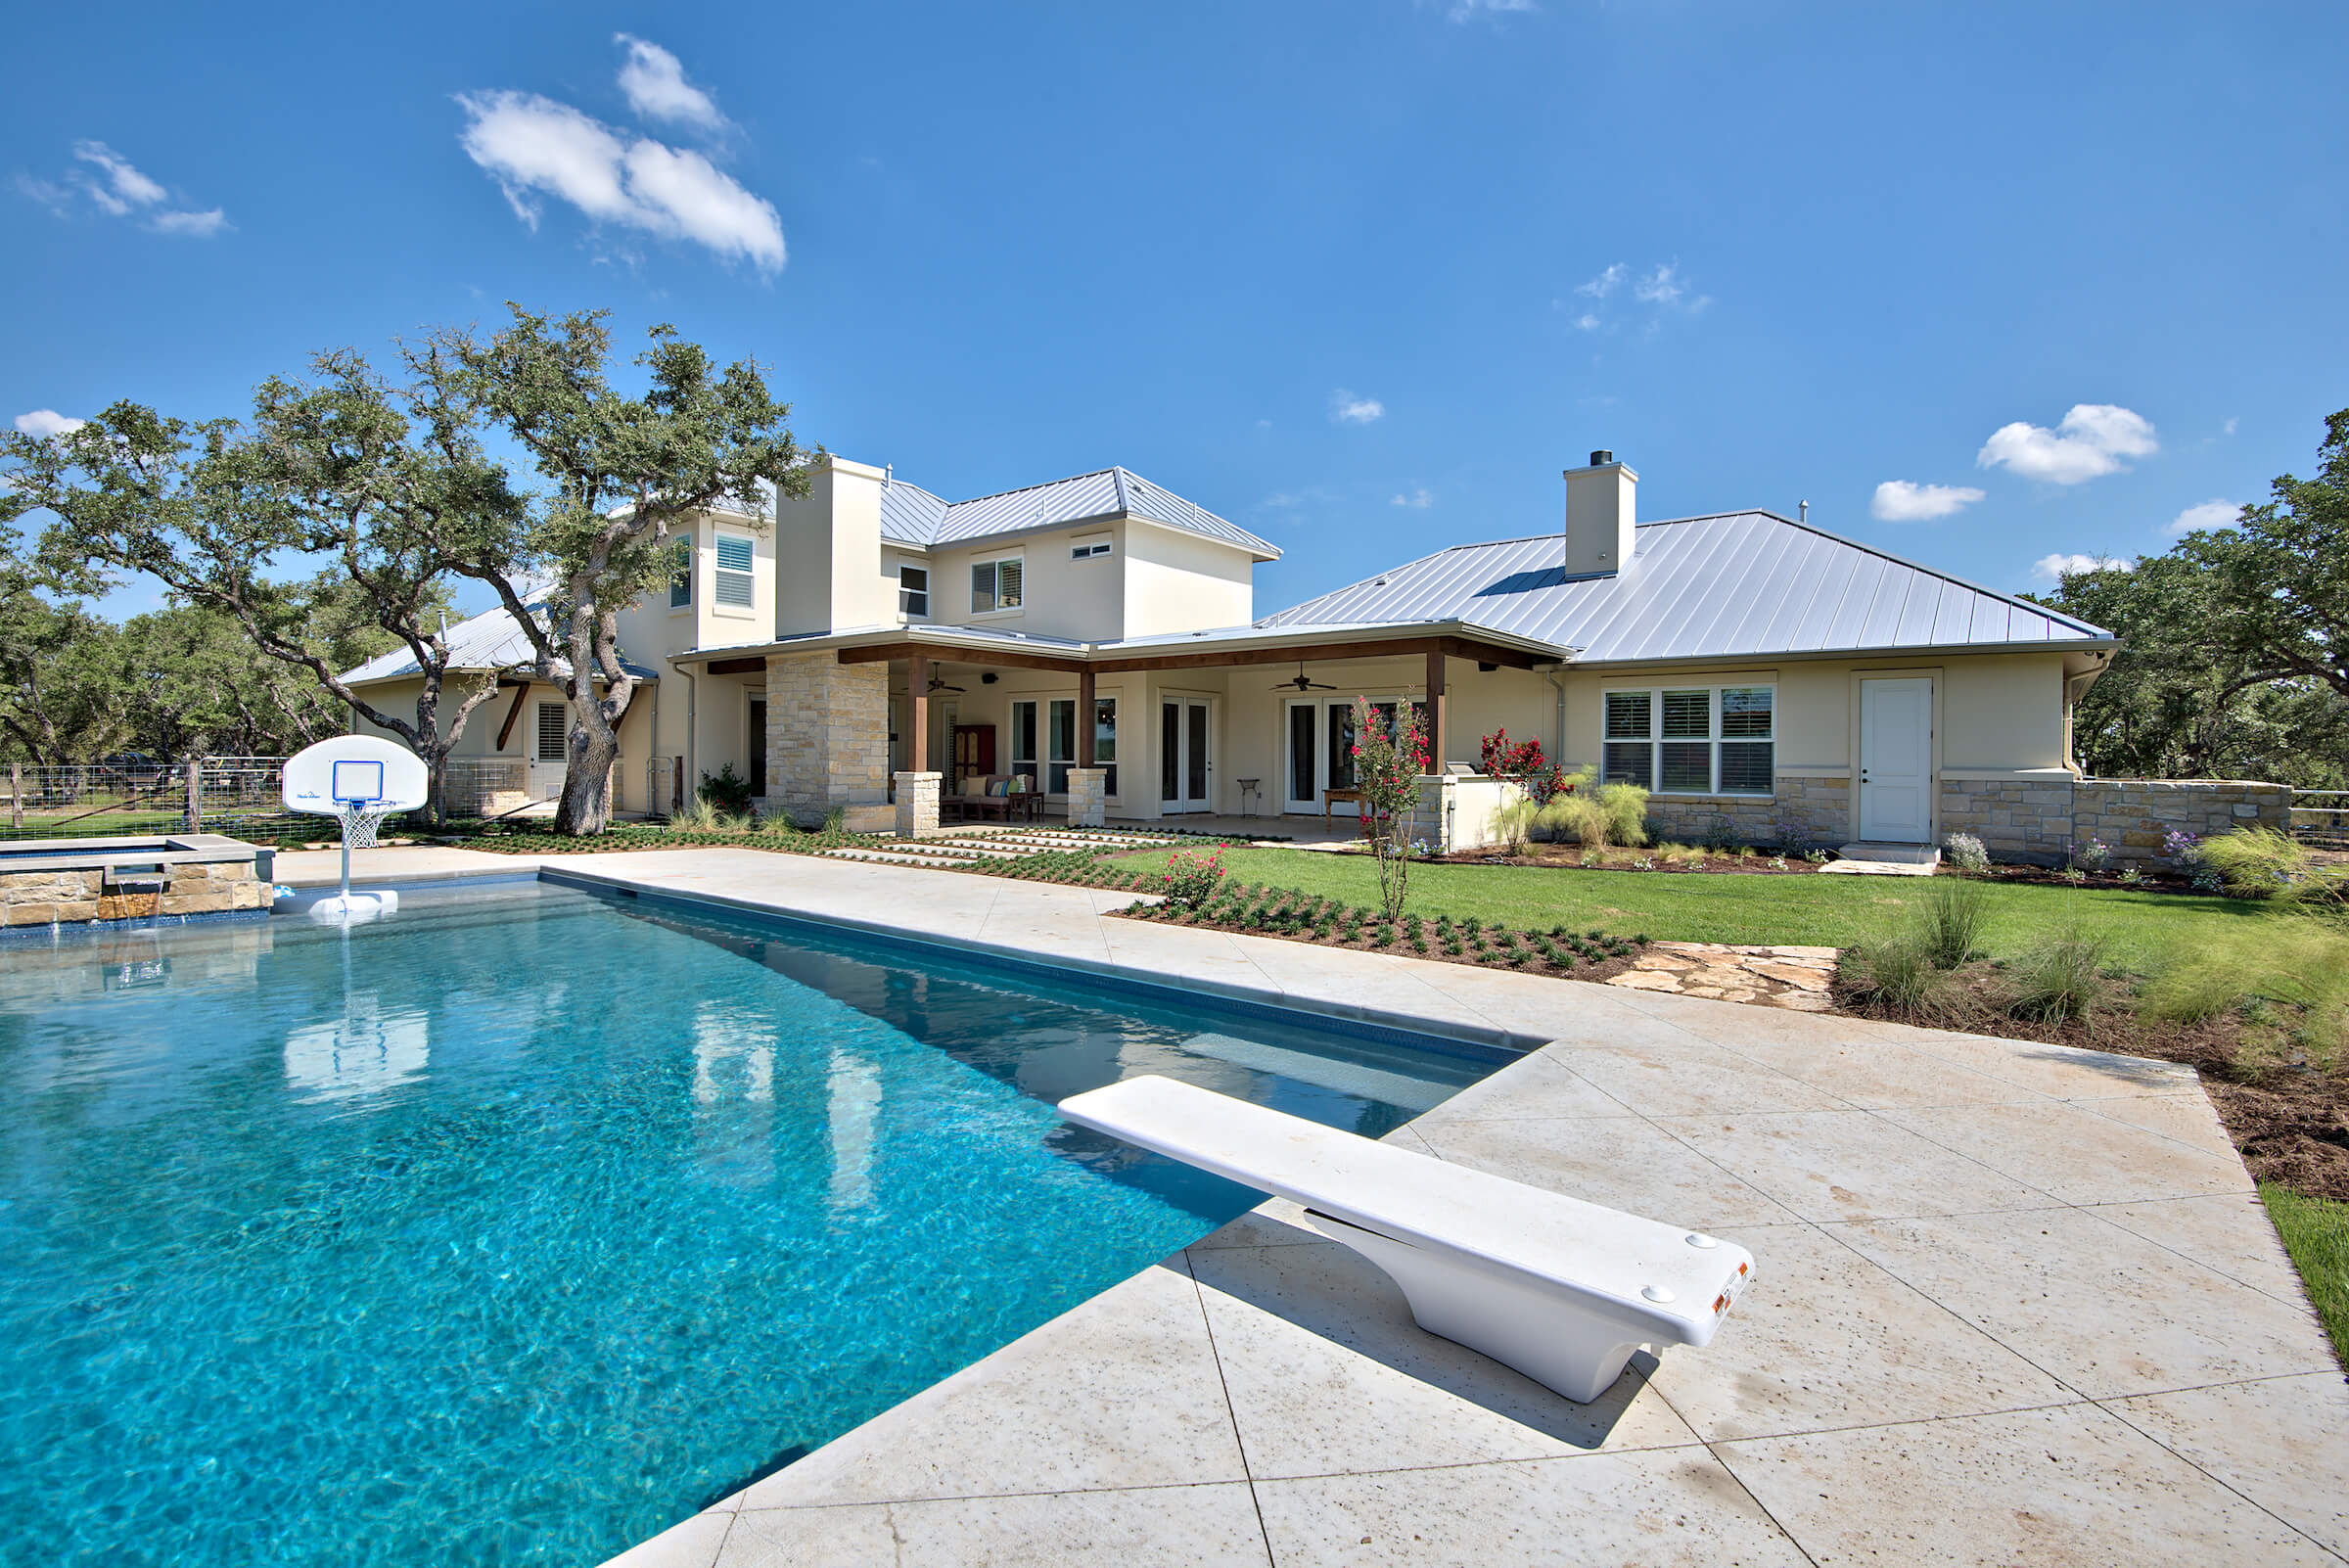 Austin swimming pool